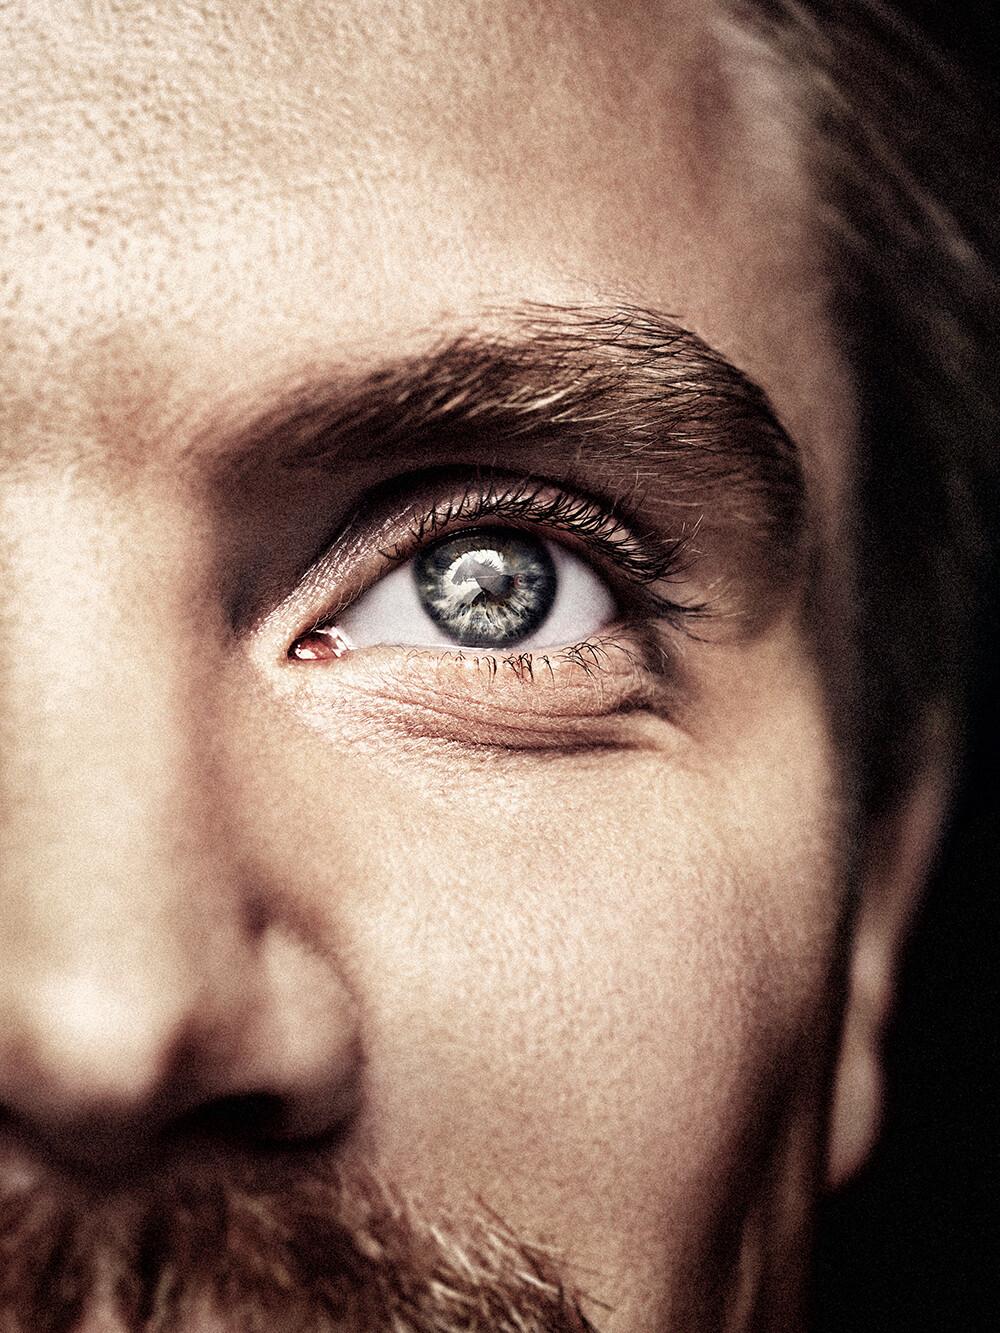 Alexander crispin atg eye 2